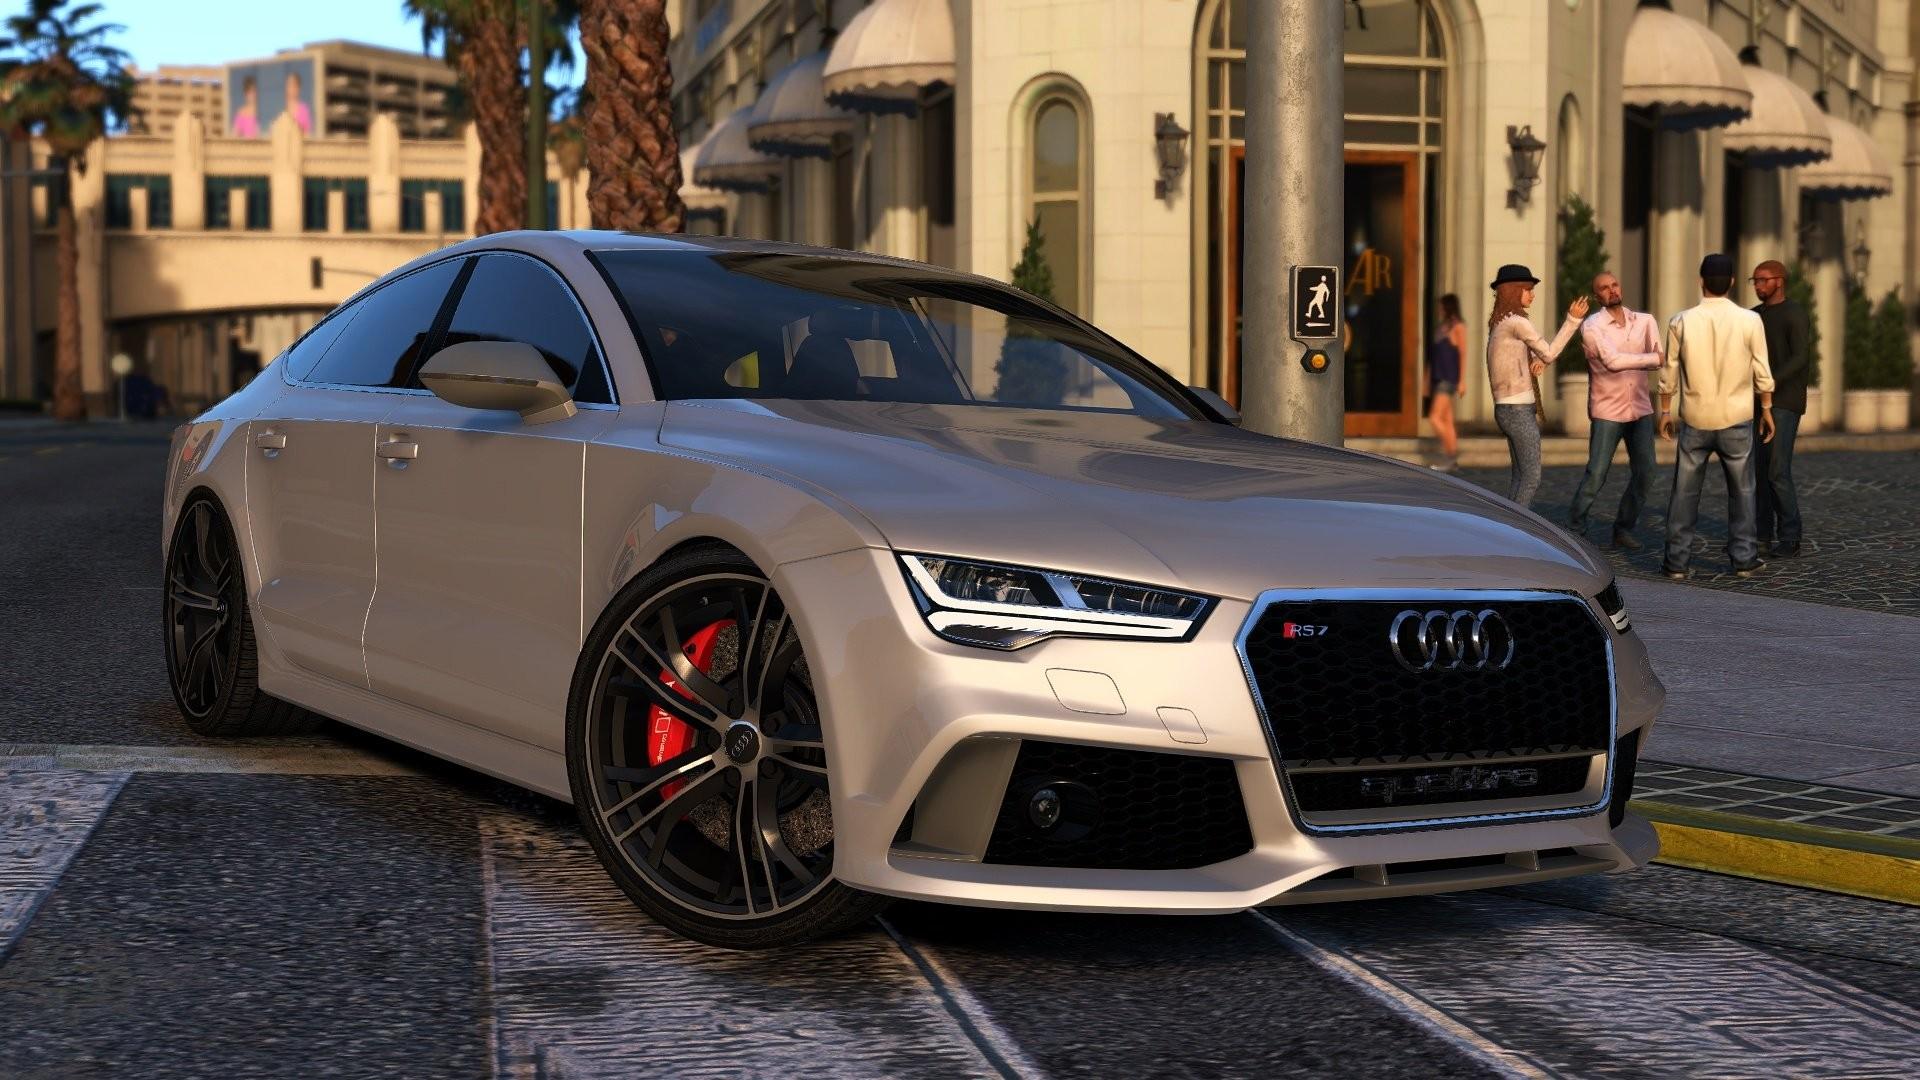 Free download Audi RS7 Wallpaper 17 1920 X 1080 stmednet ...